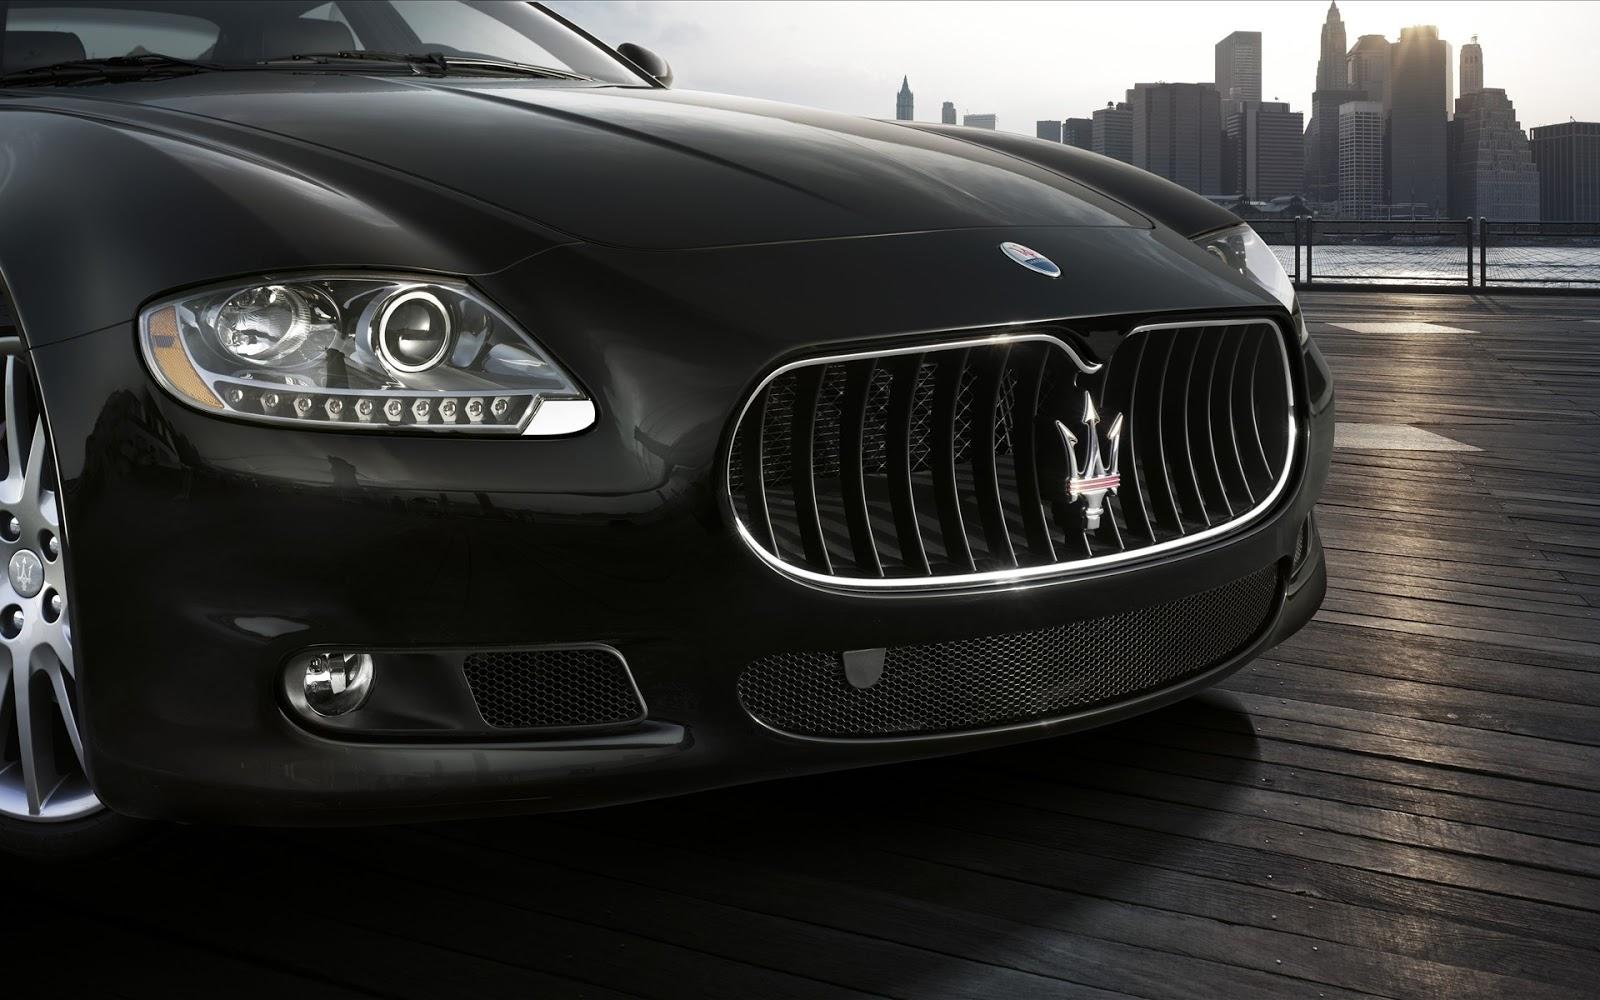 http://1.bp.blogspot.com/-RIfyDfgkAuQ/UQQfo_tPtxI/AAAAAAAAAtM/i_YvIjKC7_4/s1600/Maserati+Grille+Logo+Wallpaper.jpg